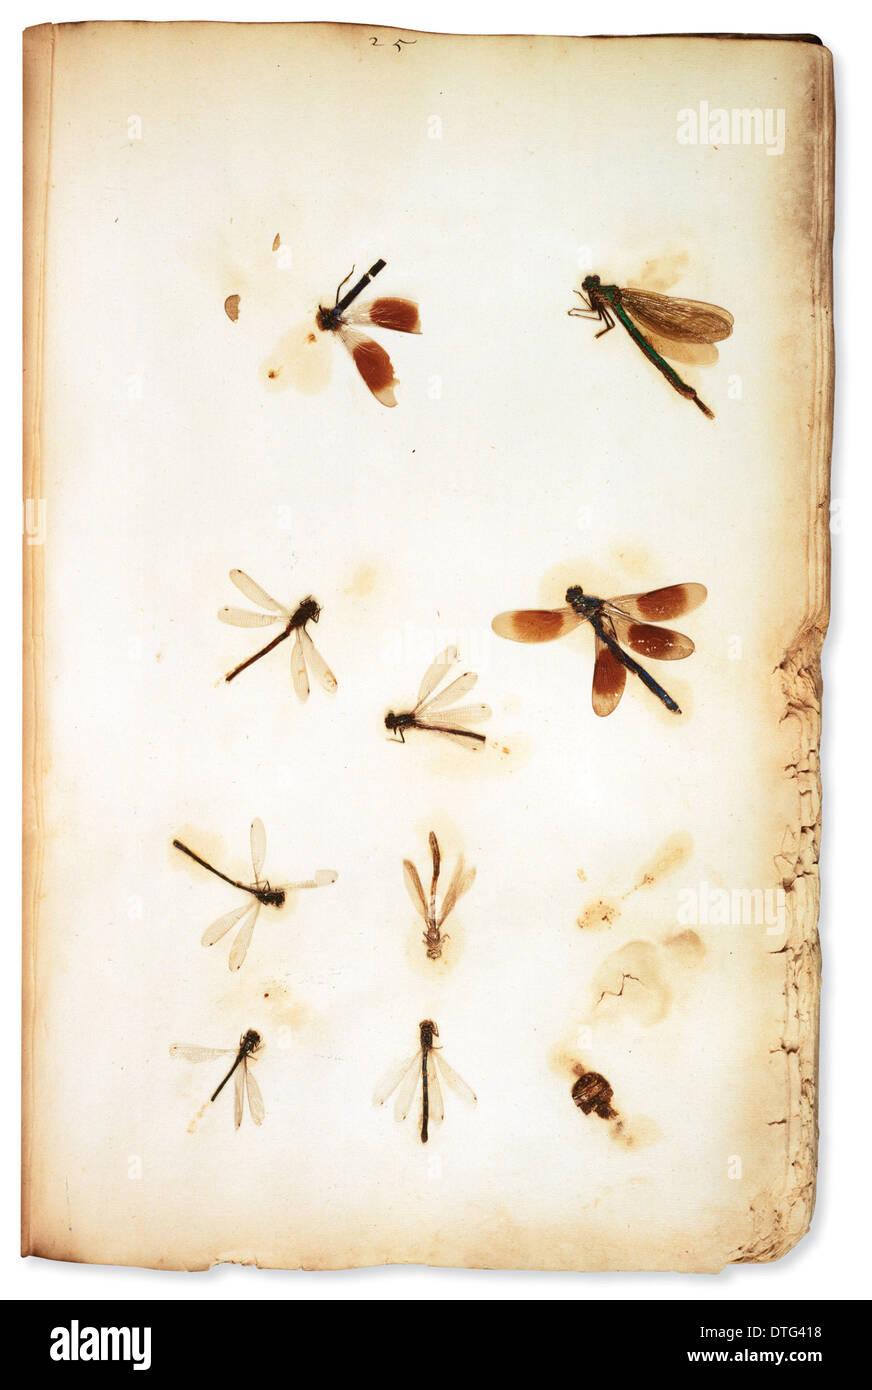 Pressed insects, mounted by botanist Leonard Plukenet (1642 - 1706). - Stock Image